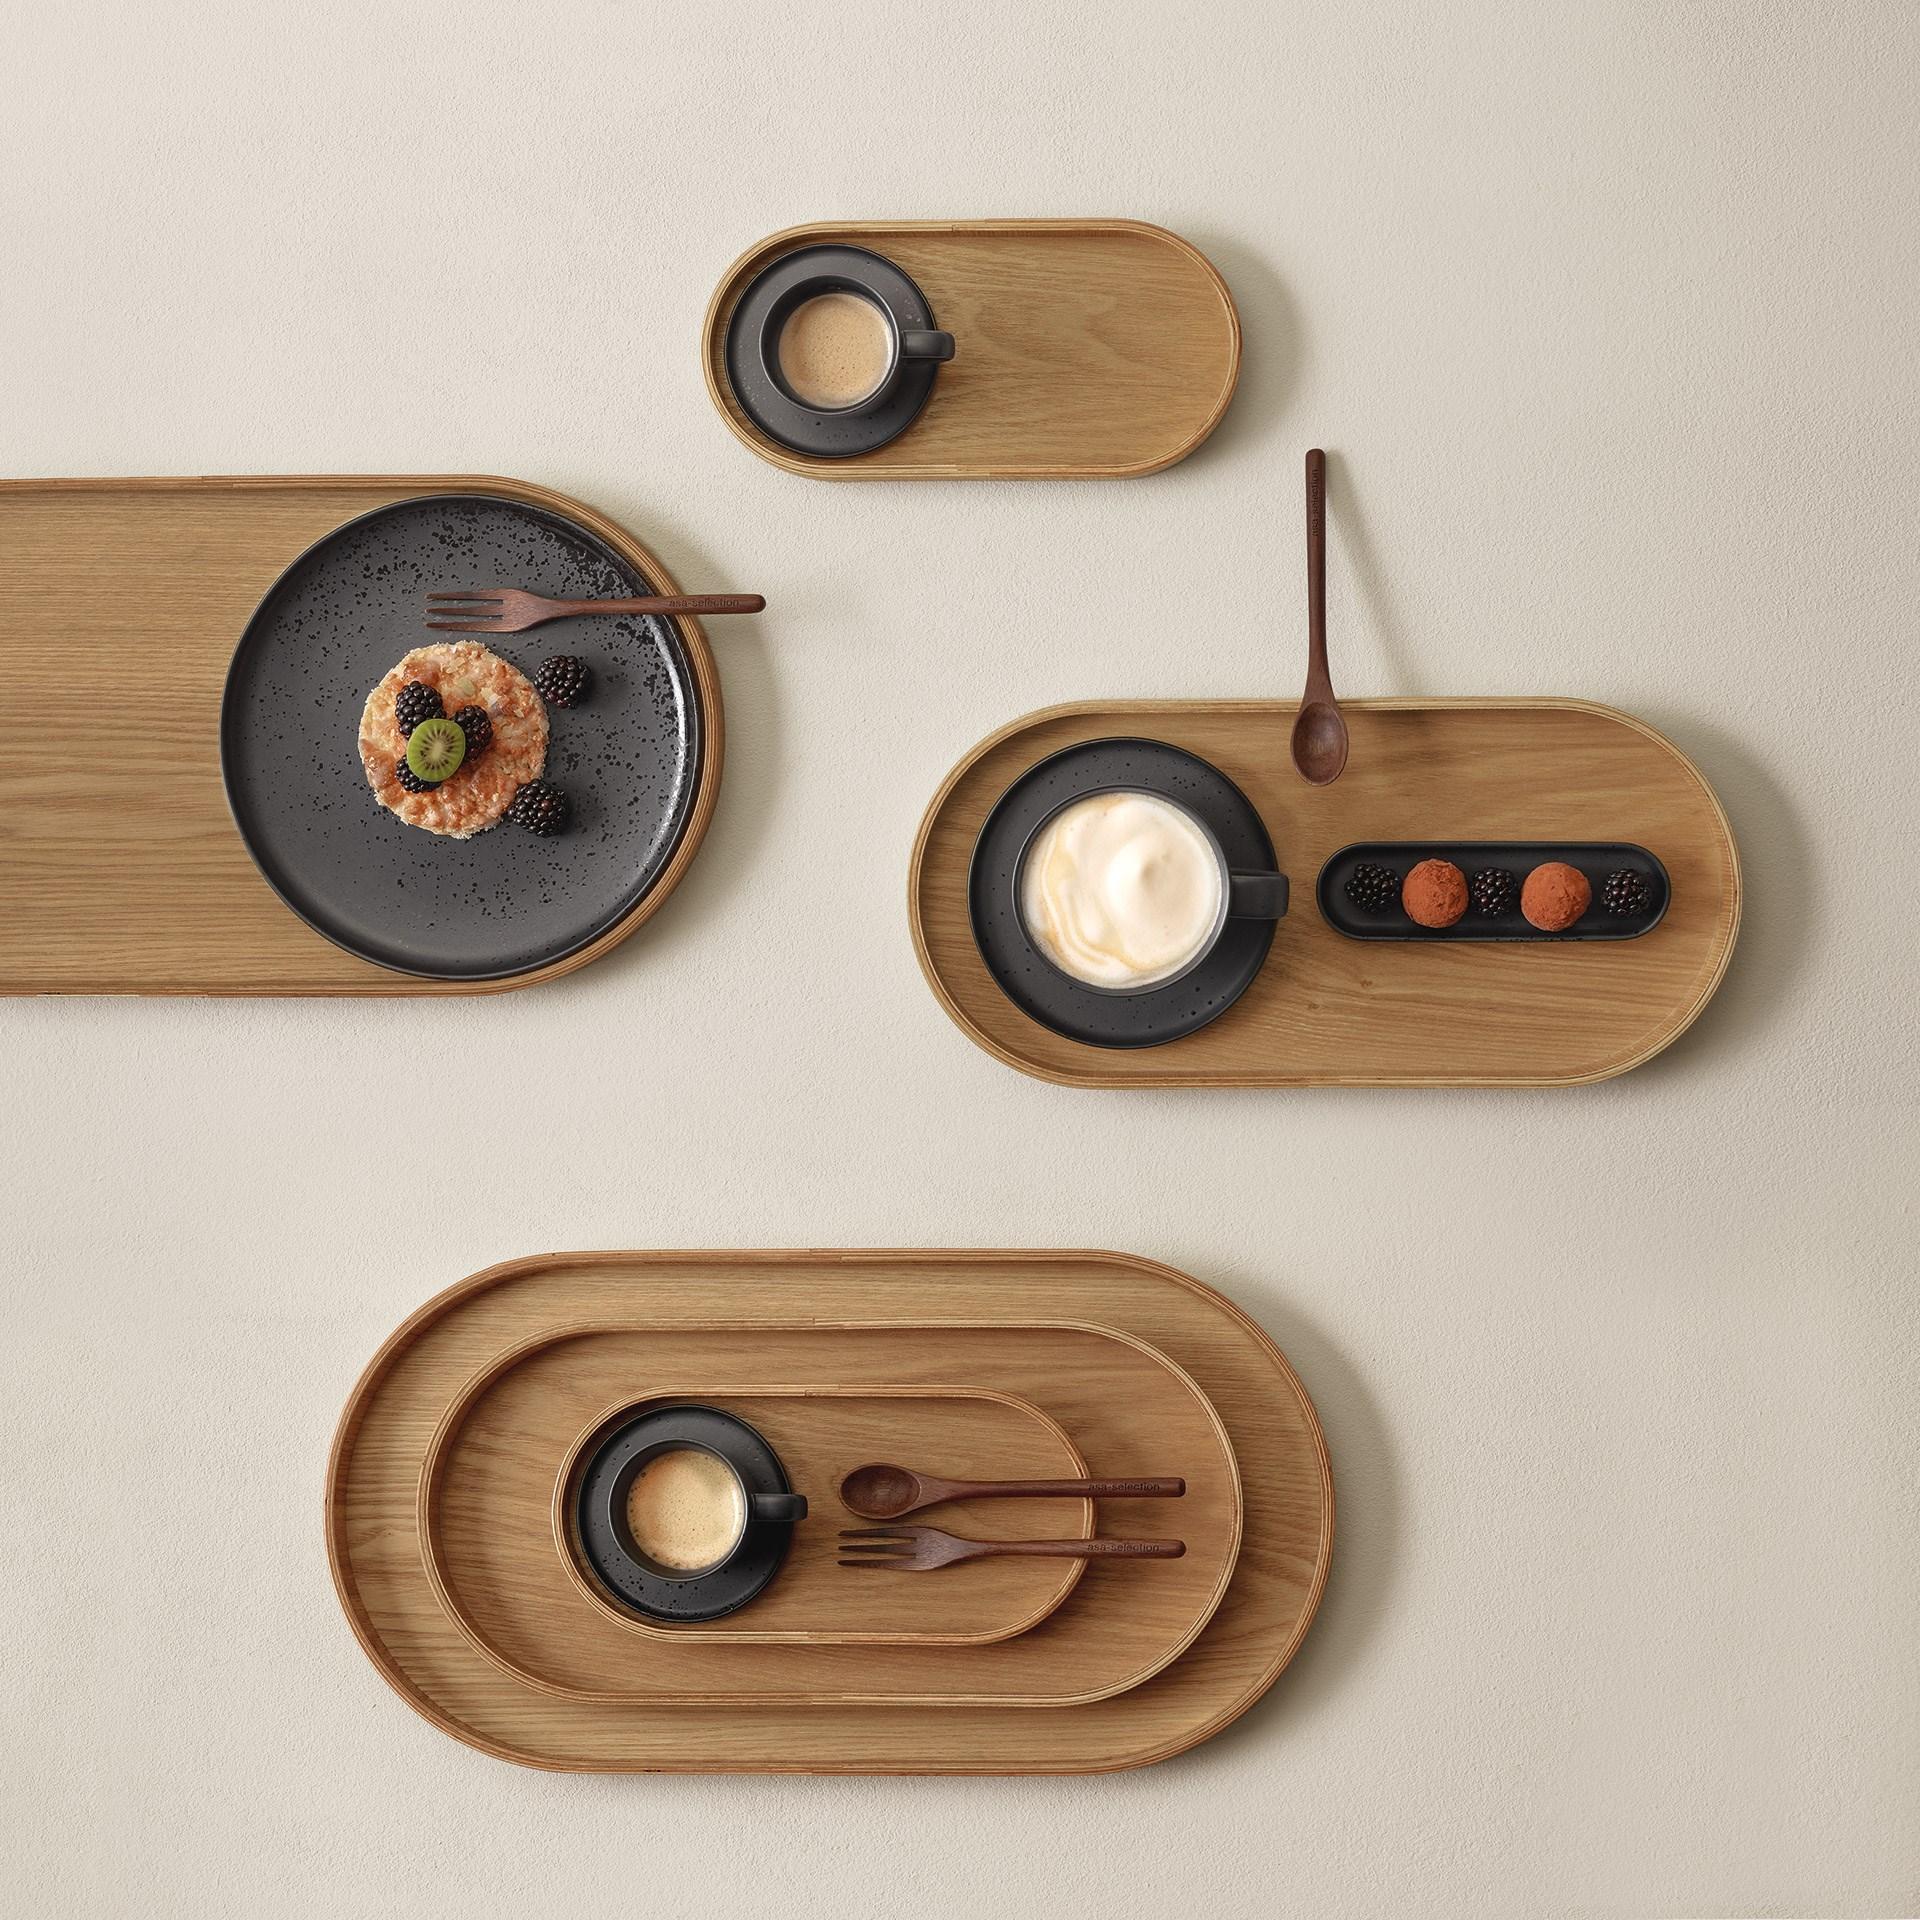 Dřevěný tác SONOKO oválný 35,5x16,5 cm_1